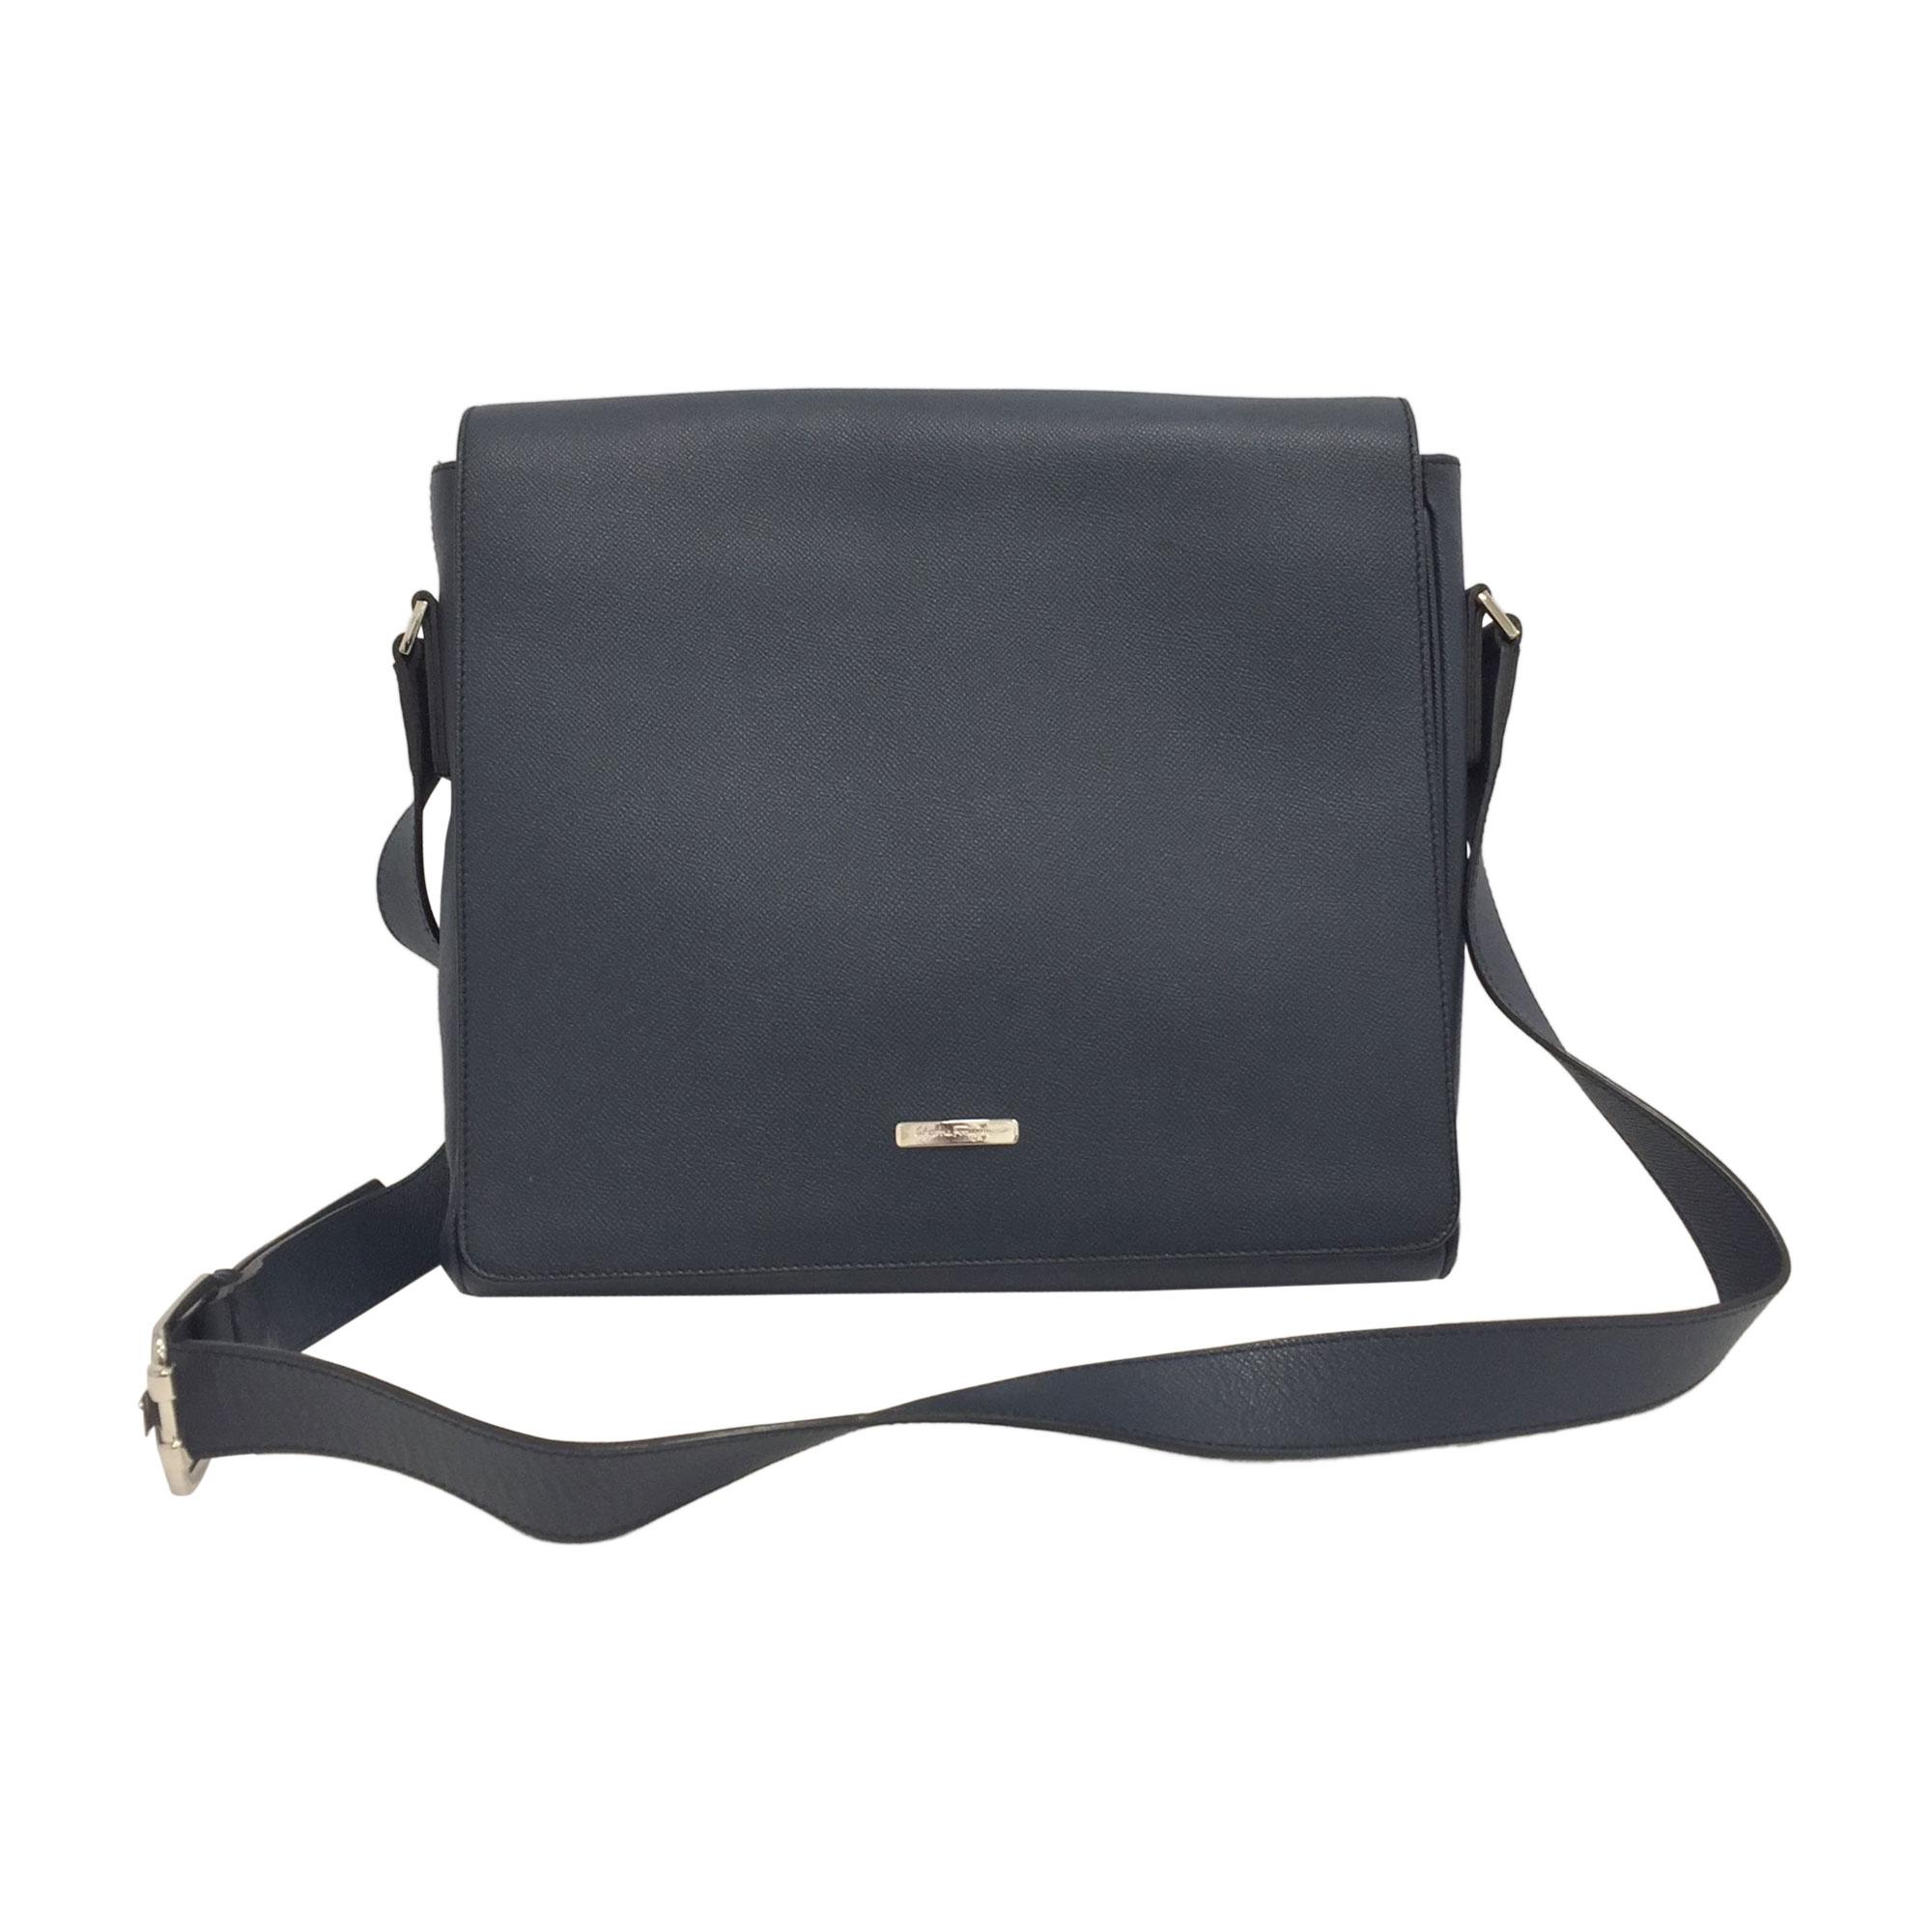 Shoulder Bag SALVATORE FERRAGAMO Blue, navy, turquoise